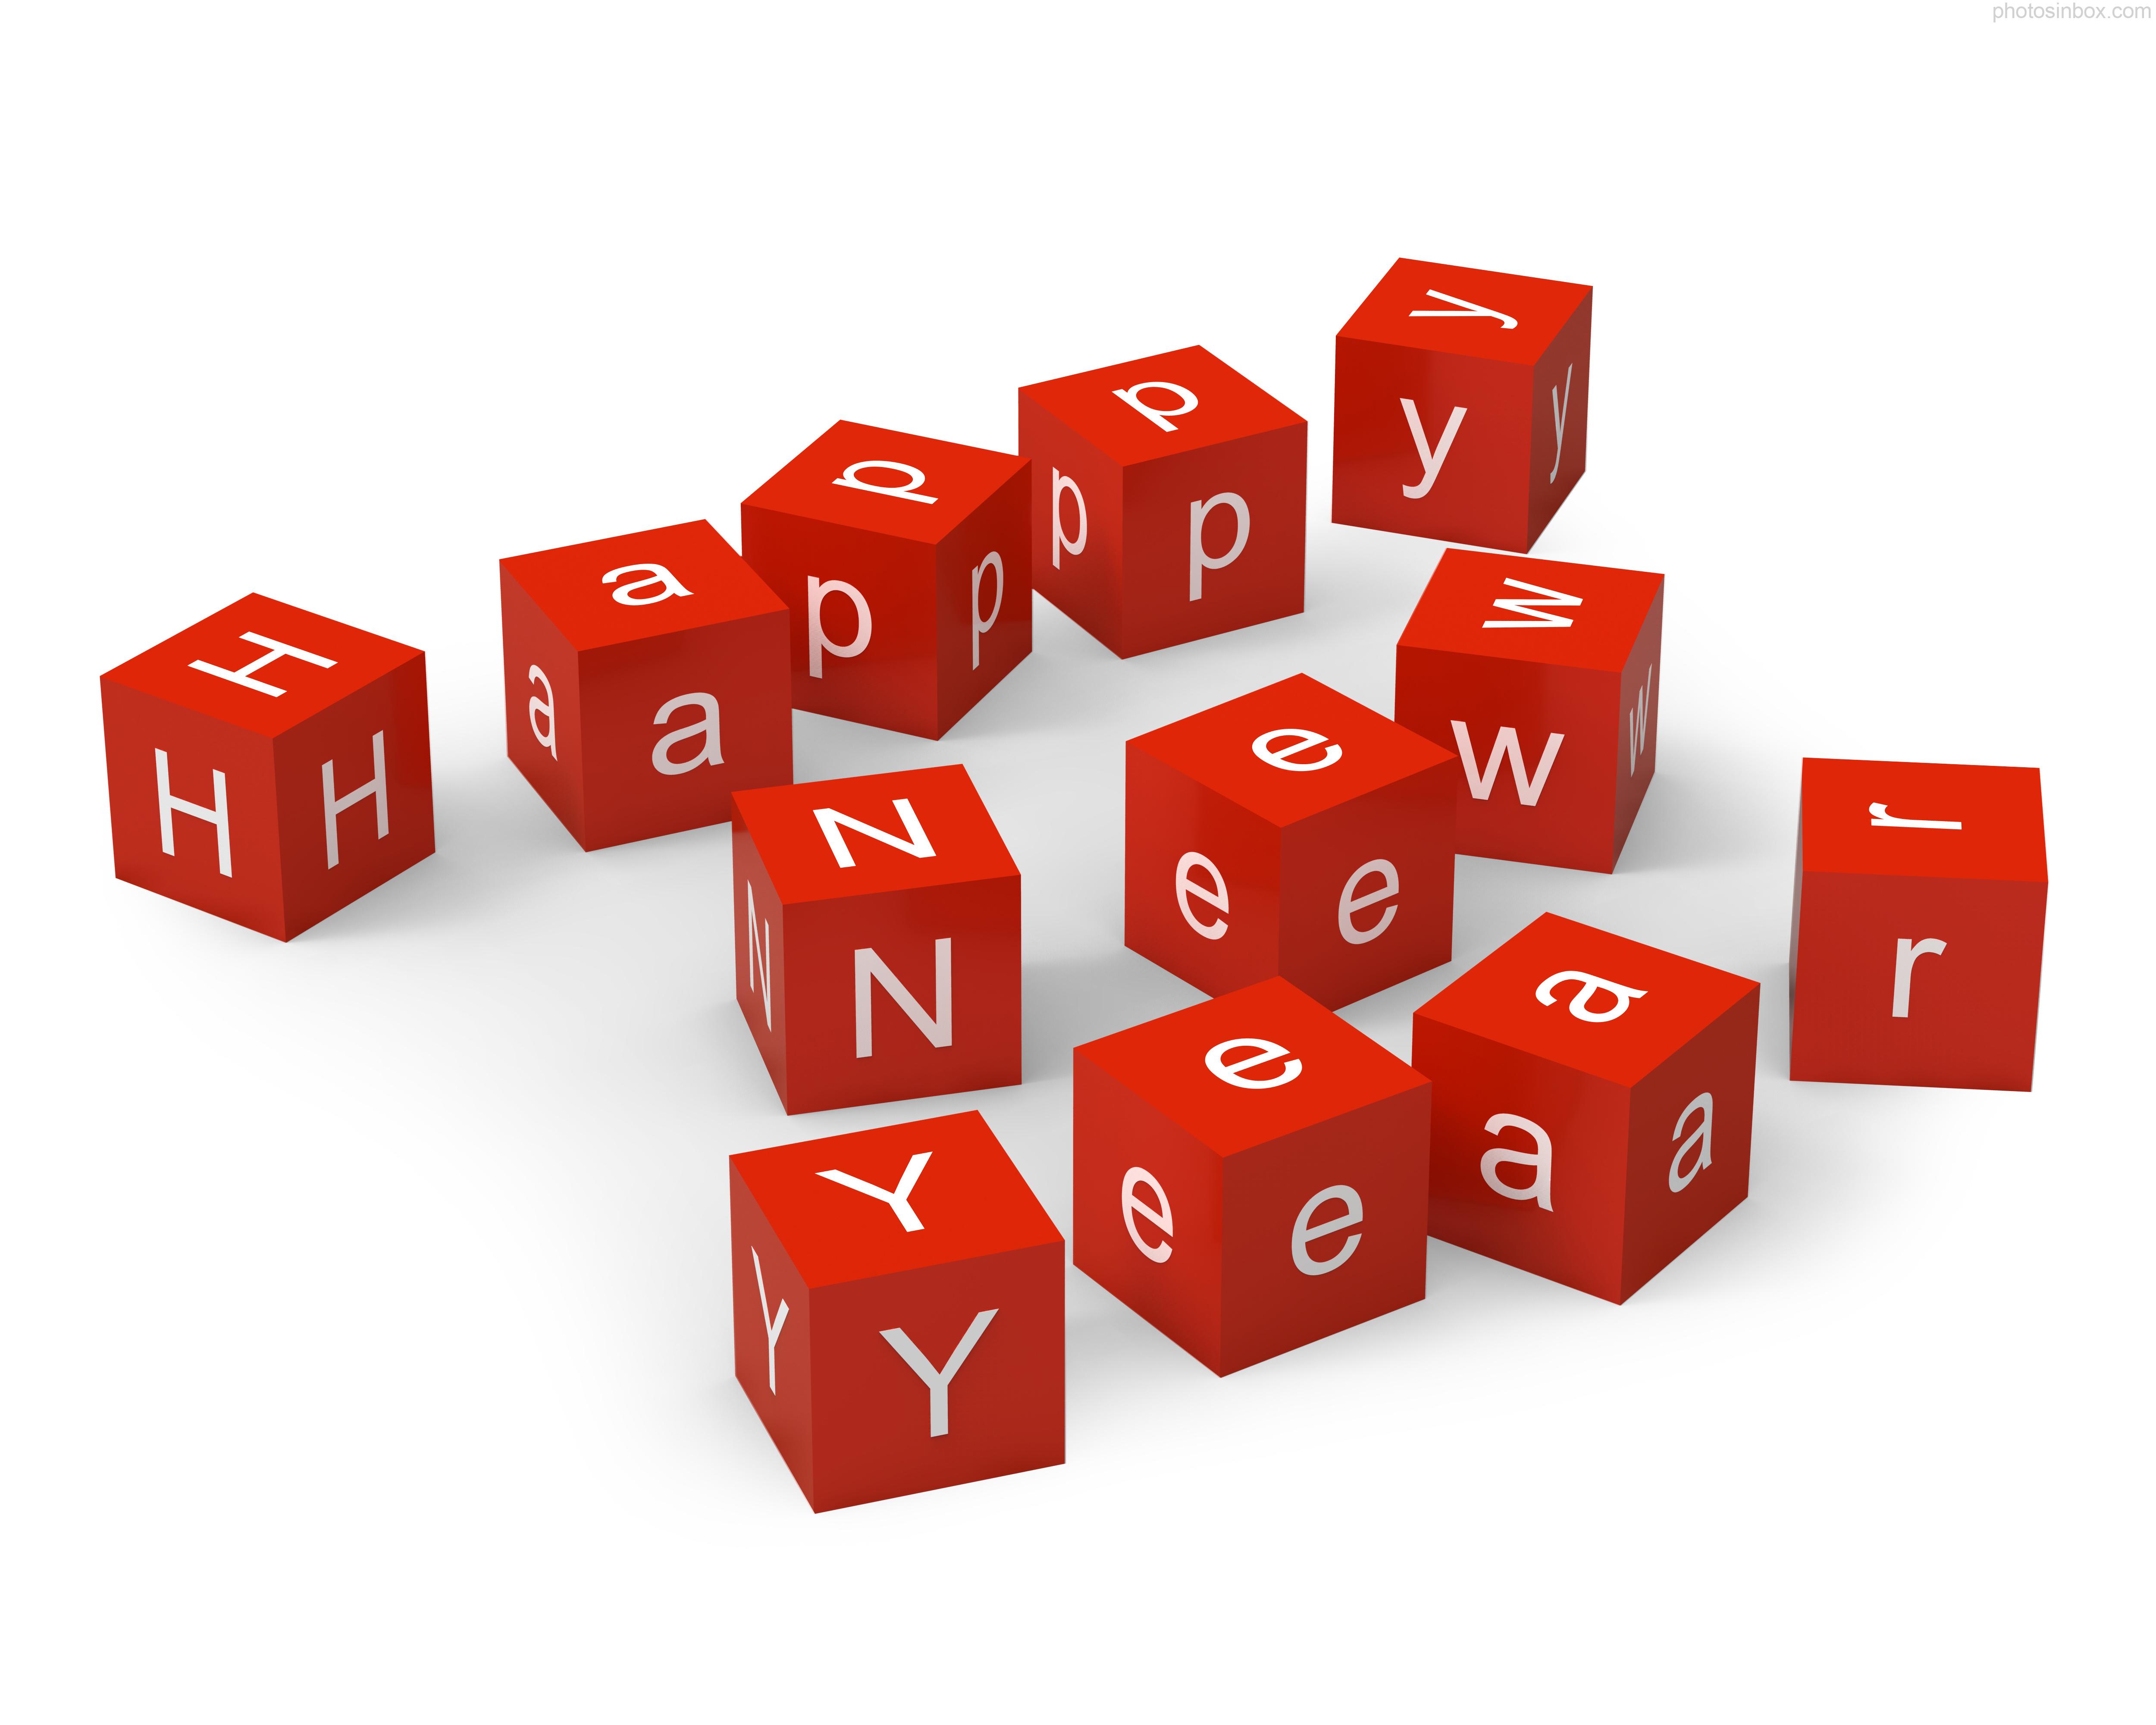 happy-new-year - depreciation guru